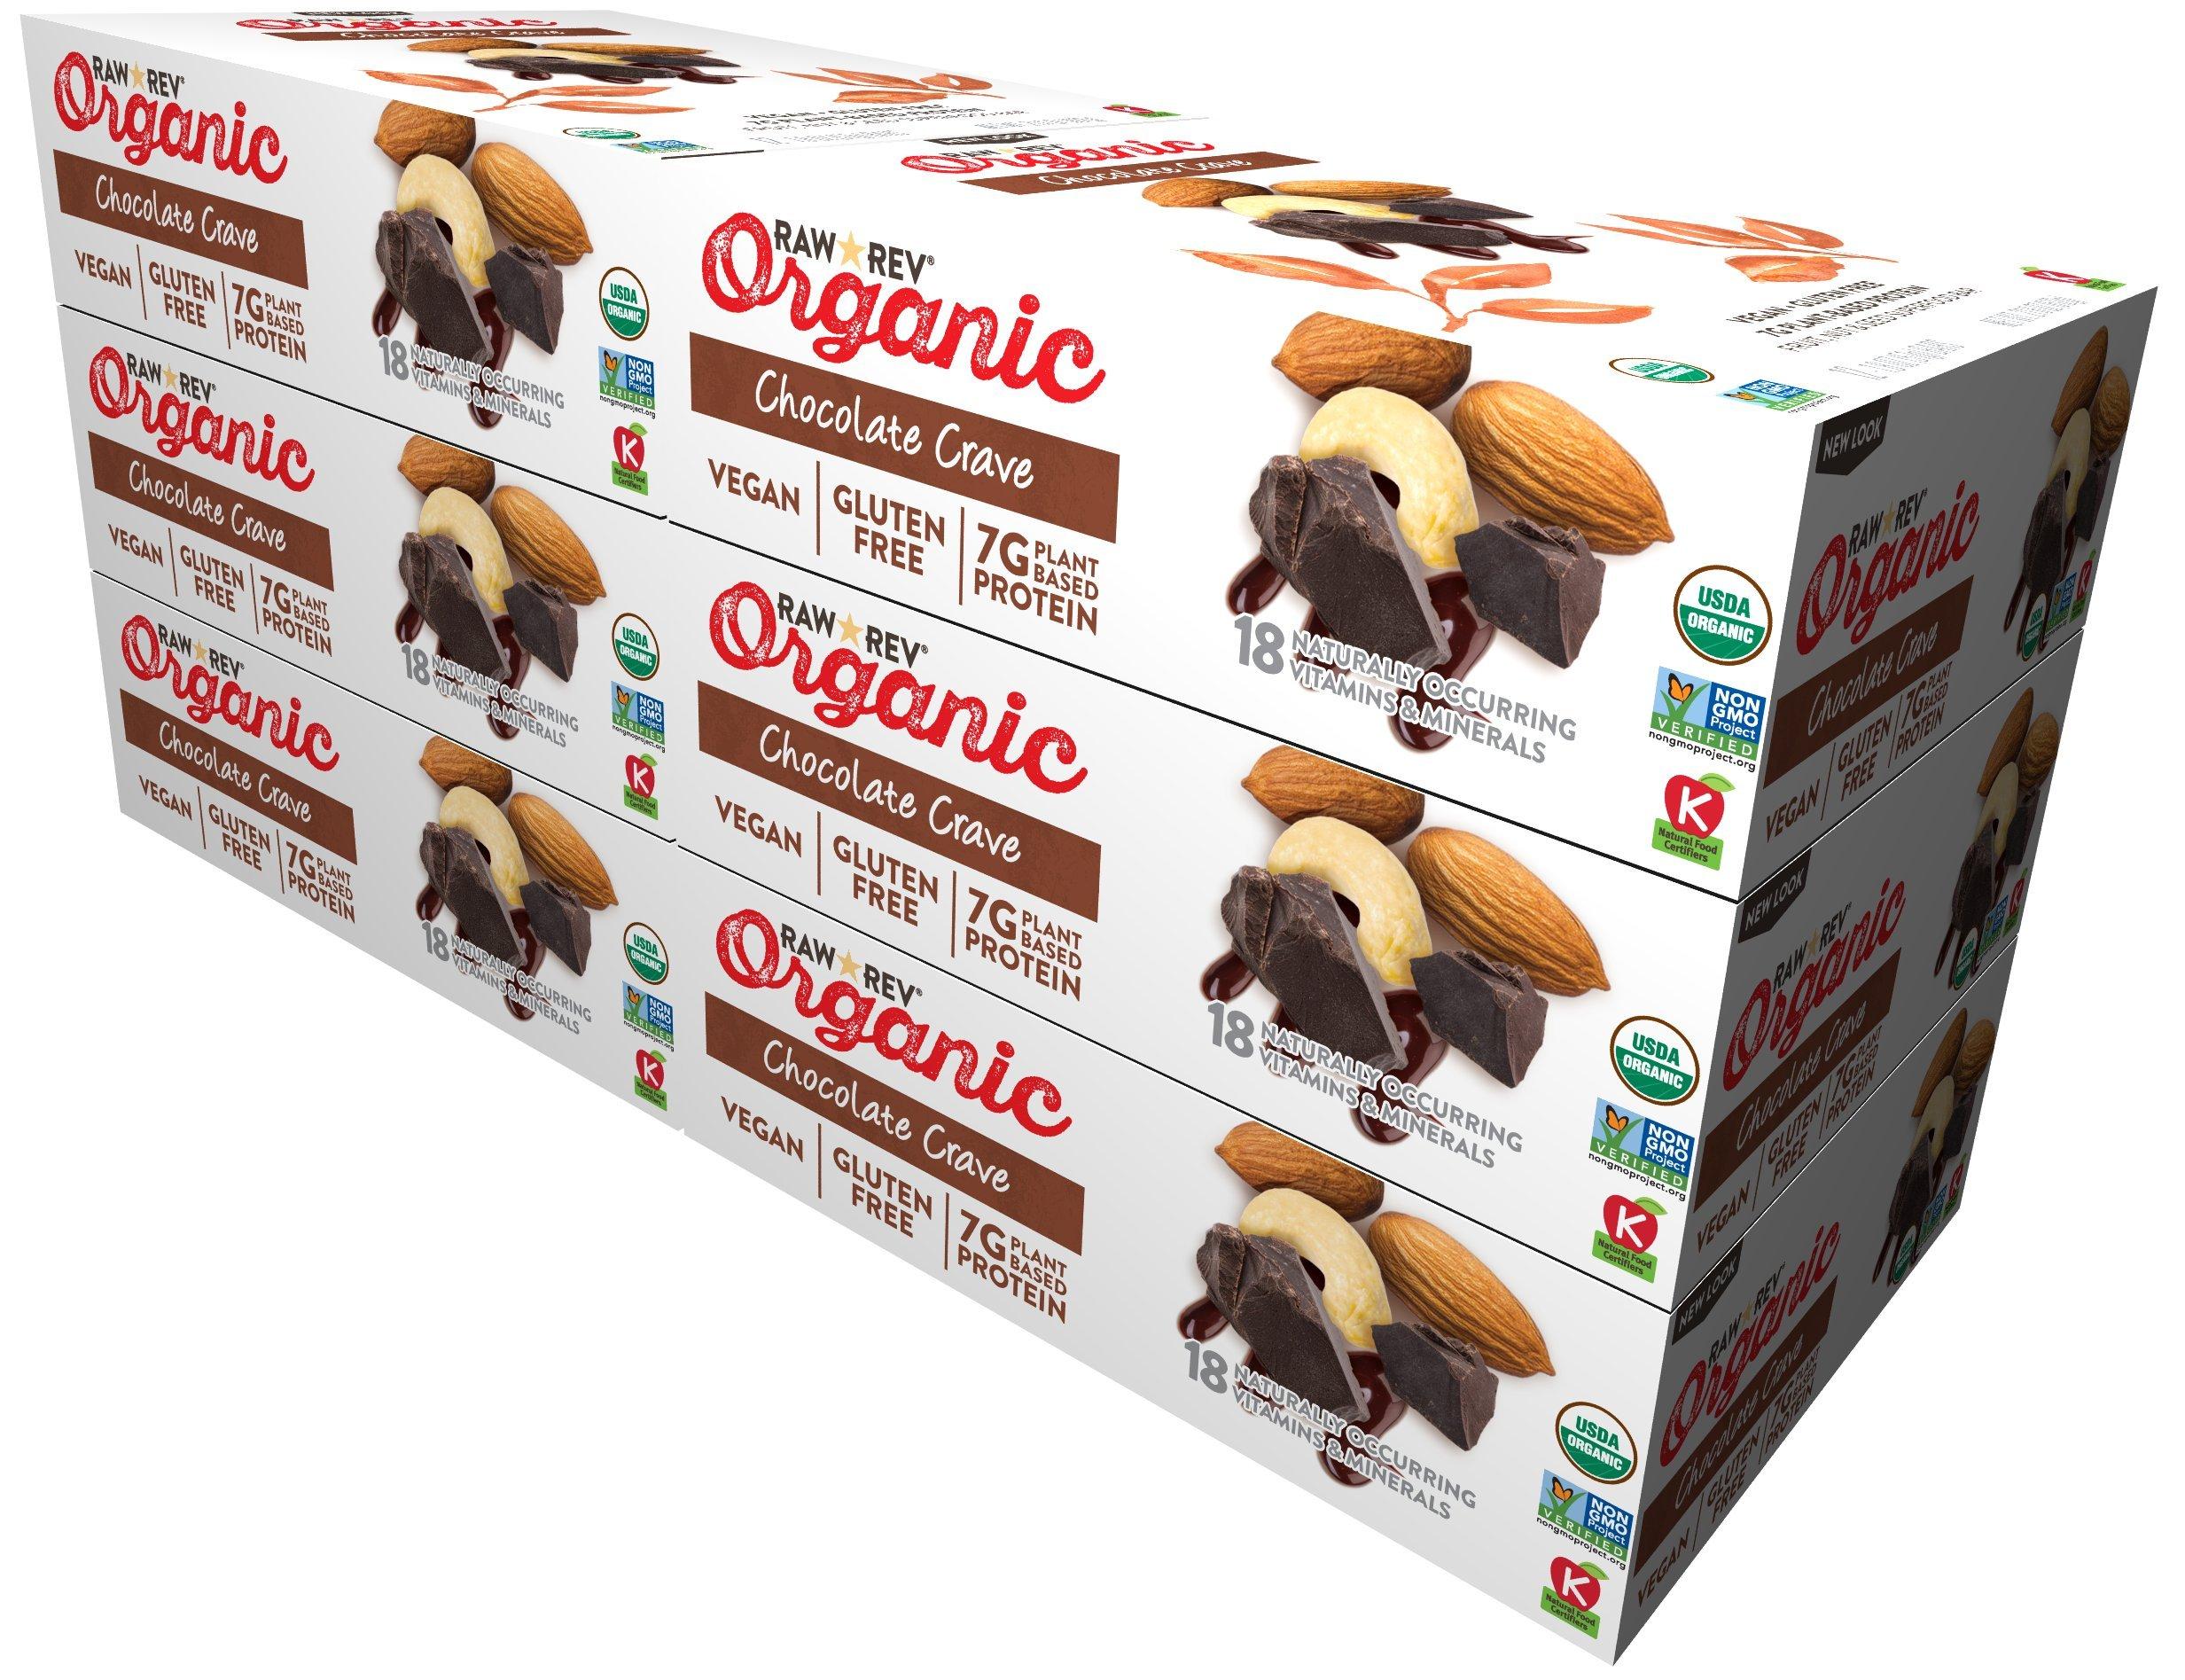 Raw Rev Organic Vegan, Gluten-Free Fruit, Nut, Seed Bars - Chocolate Crave 1.8 ounce (Pack of 72)